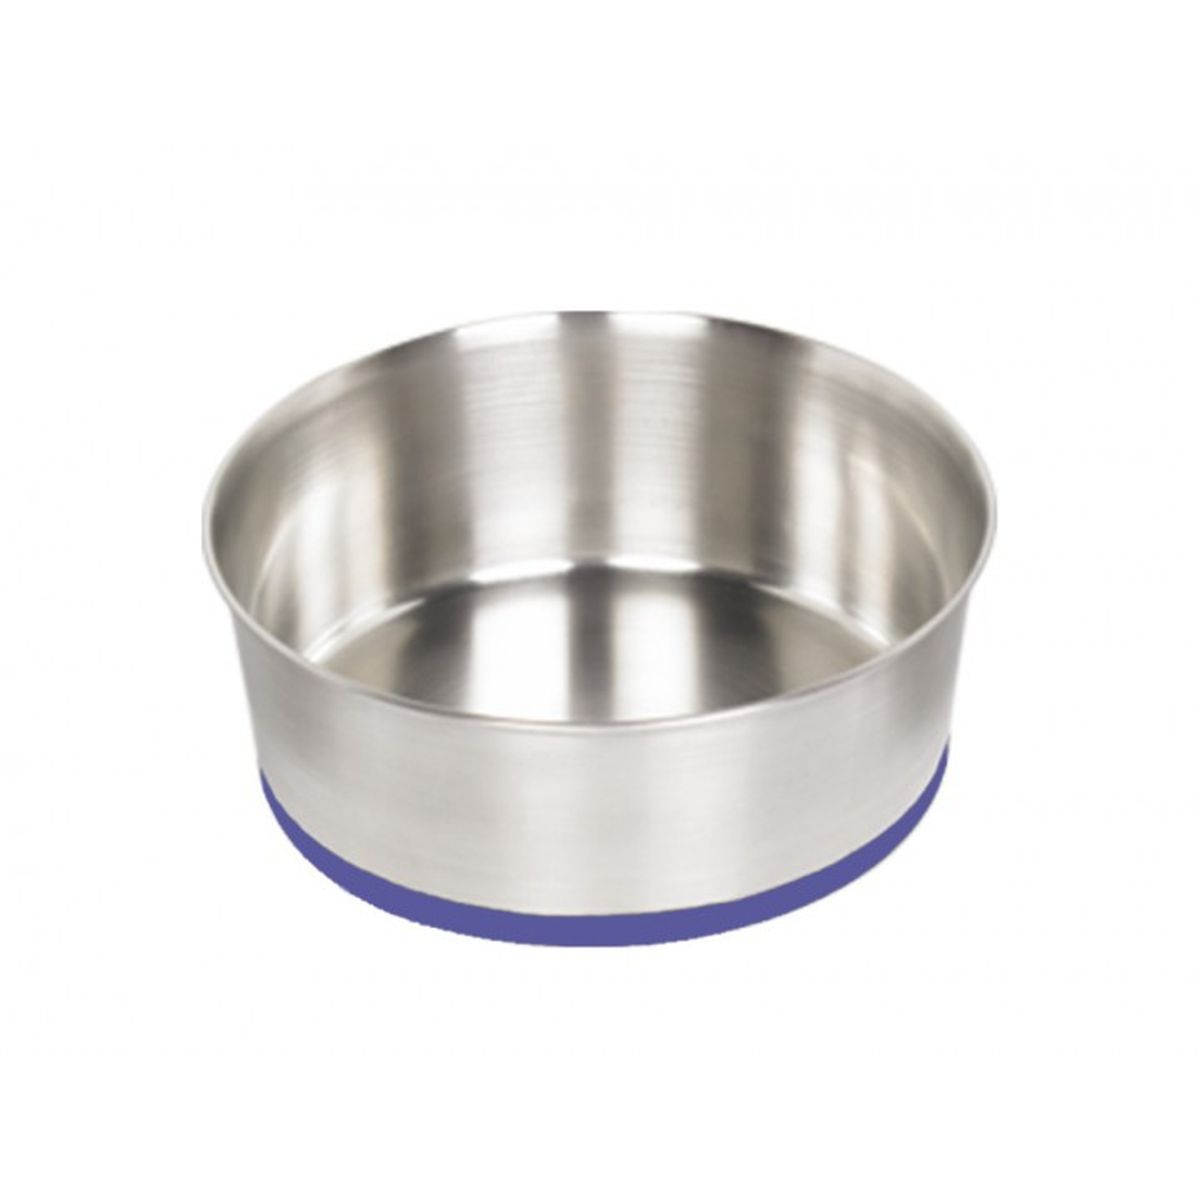 Nobby - rvs eetbak heavy mat rvs 3,9 liter